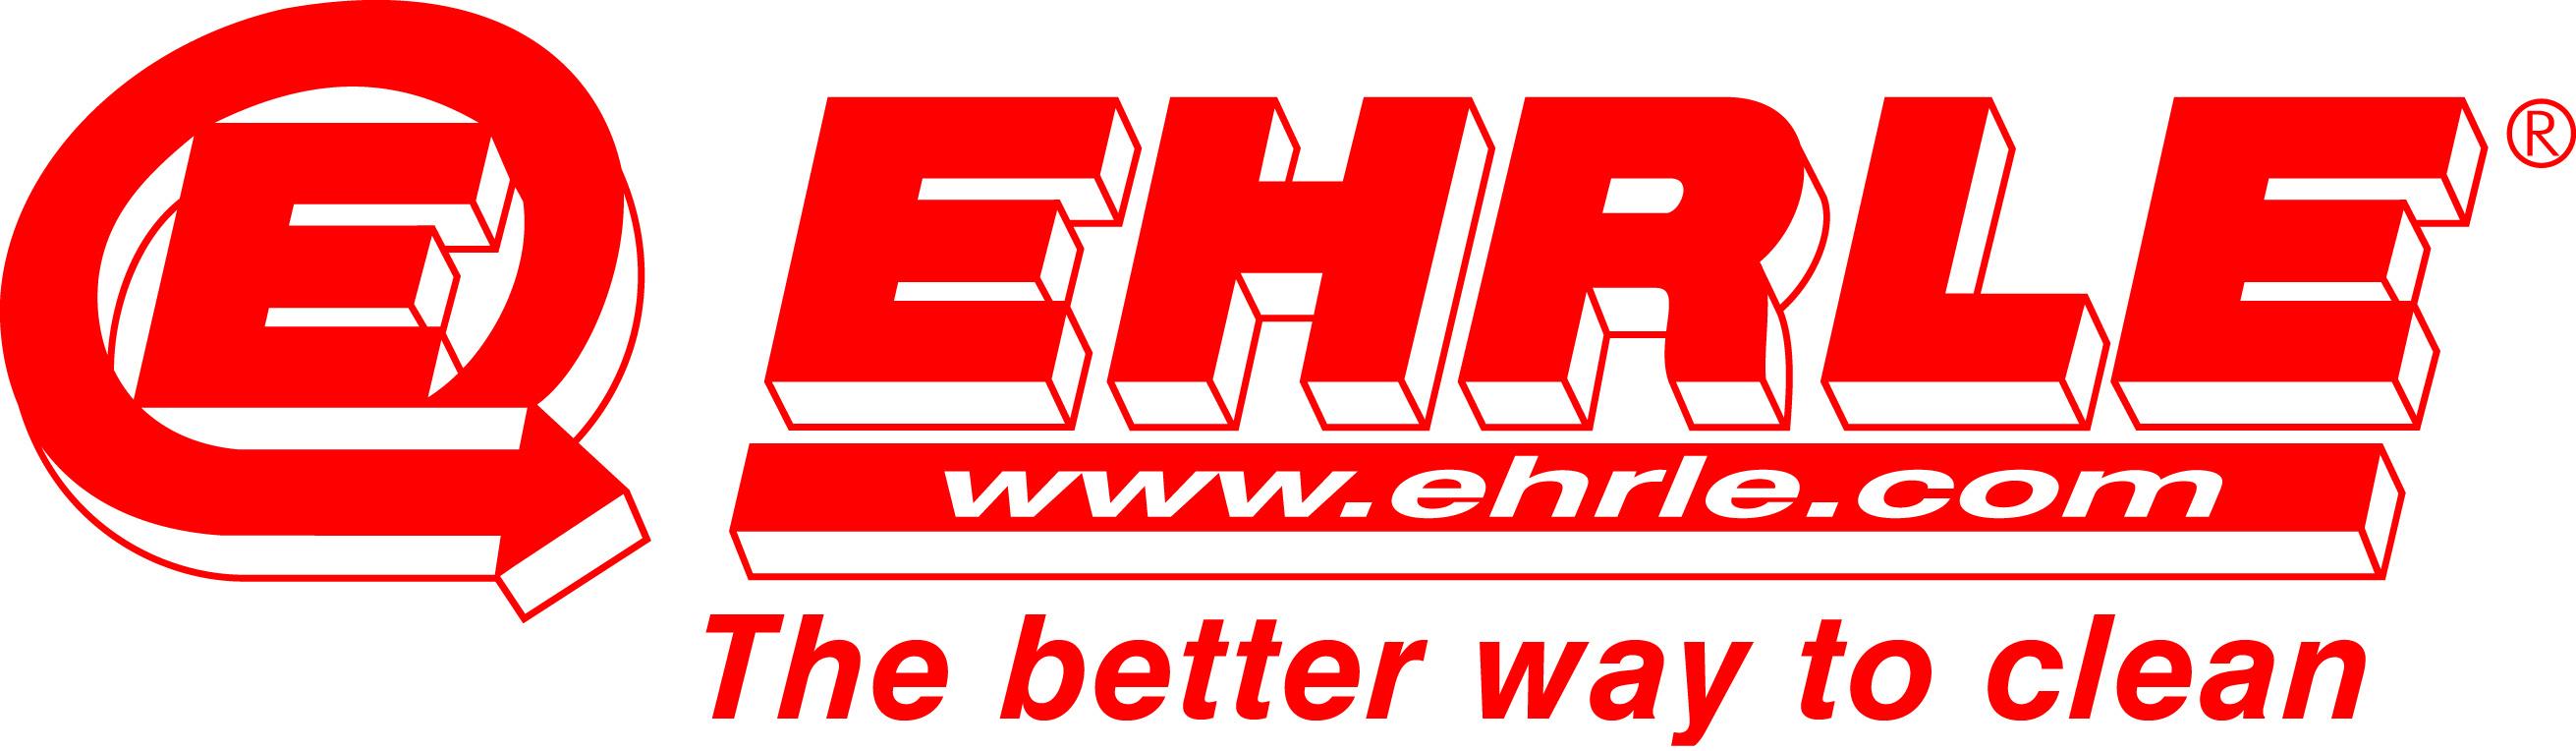 2015-EHRLE-LOGO-better-way-rot